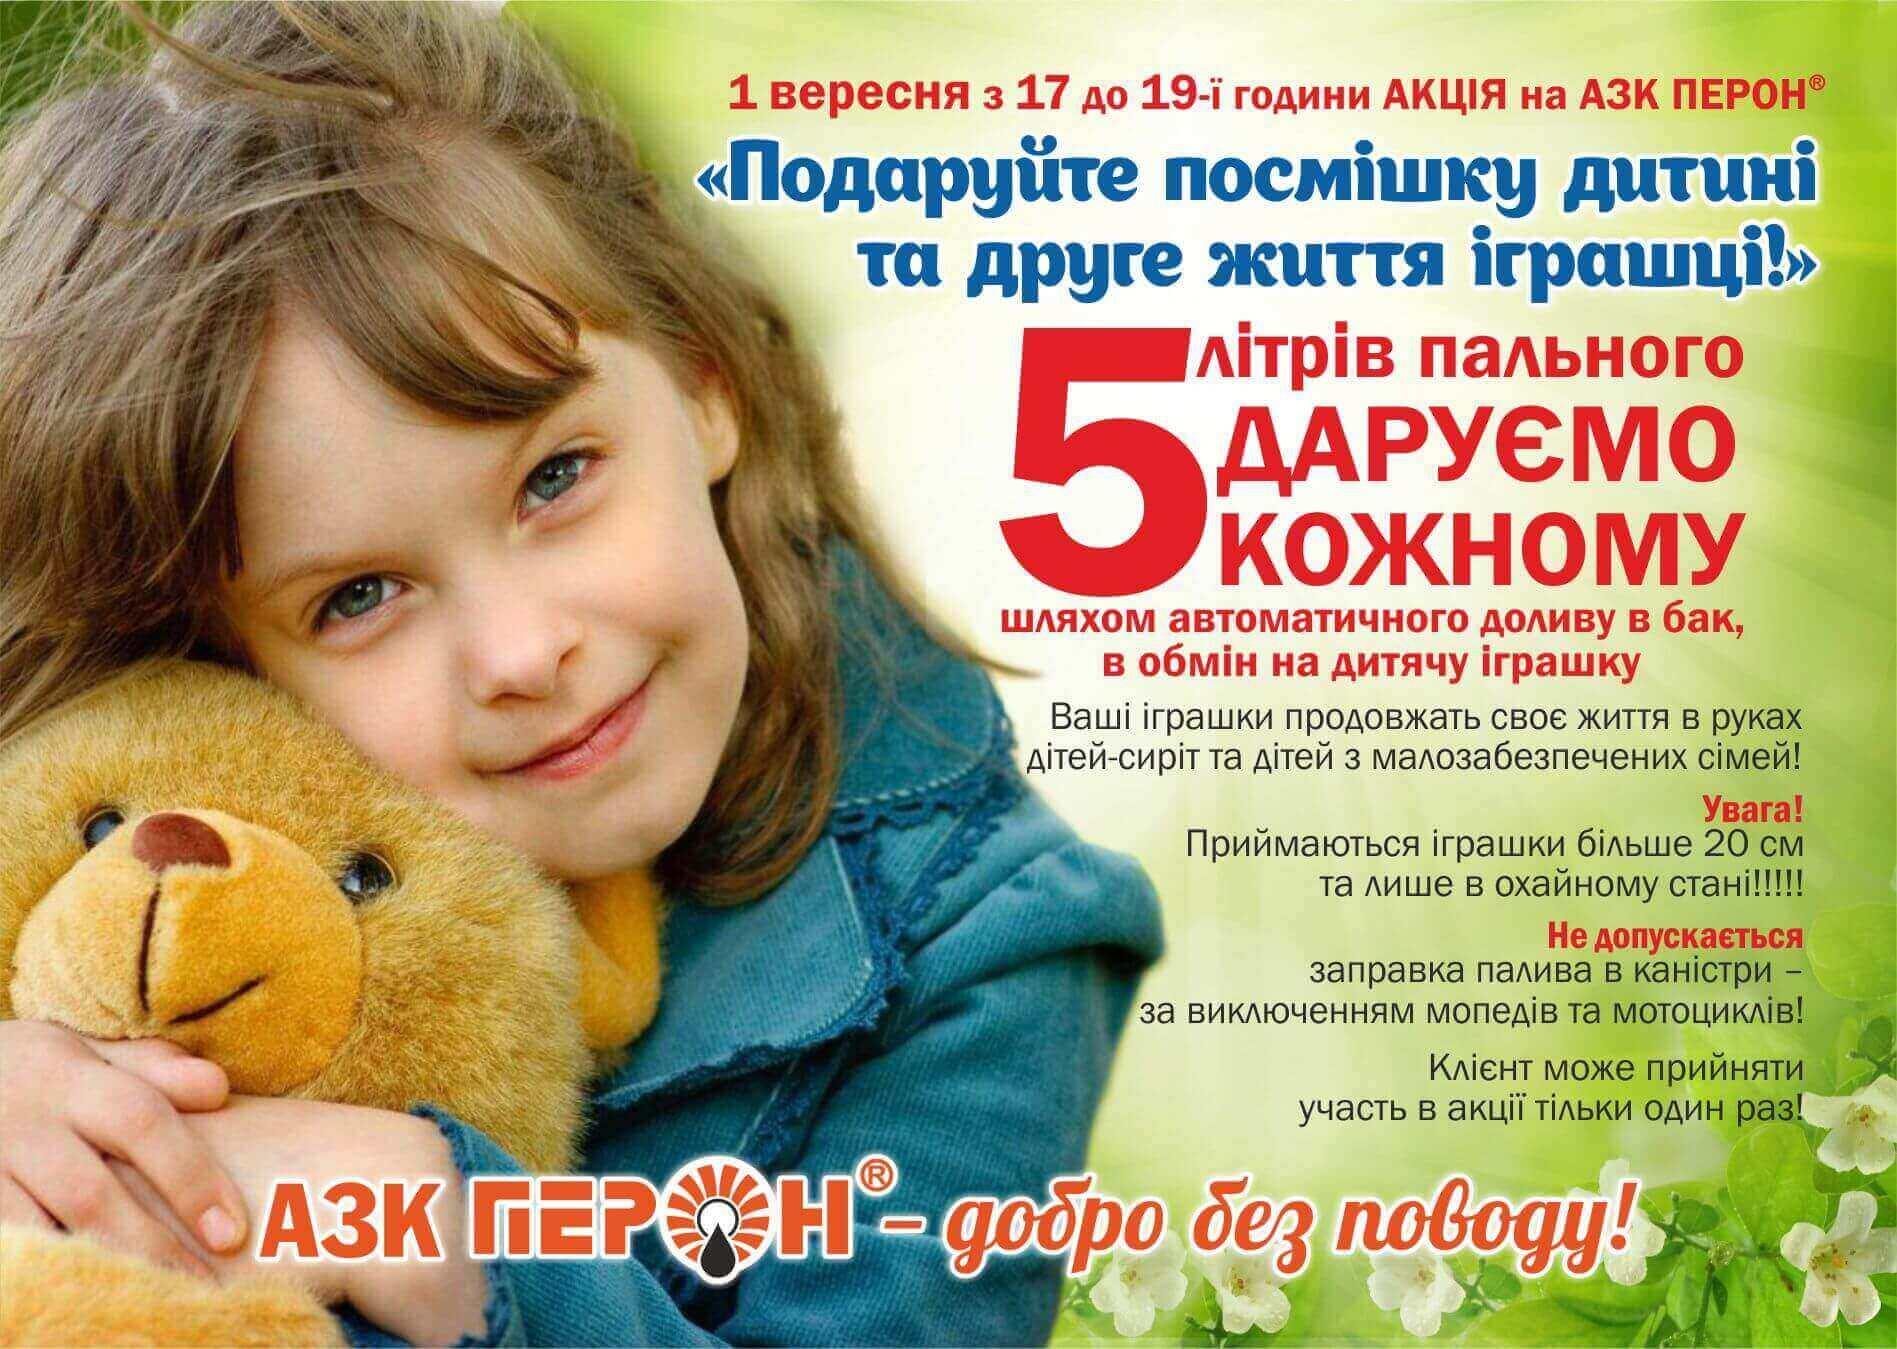 Благодiйна акція від АЗК ПЕРОН